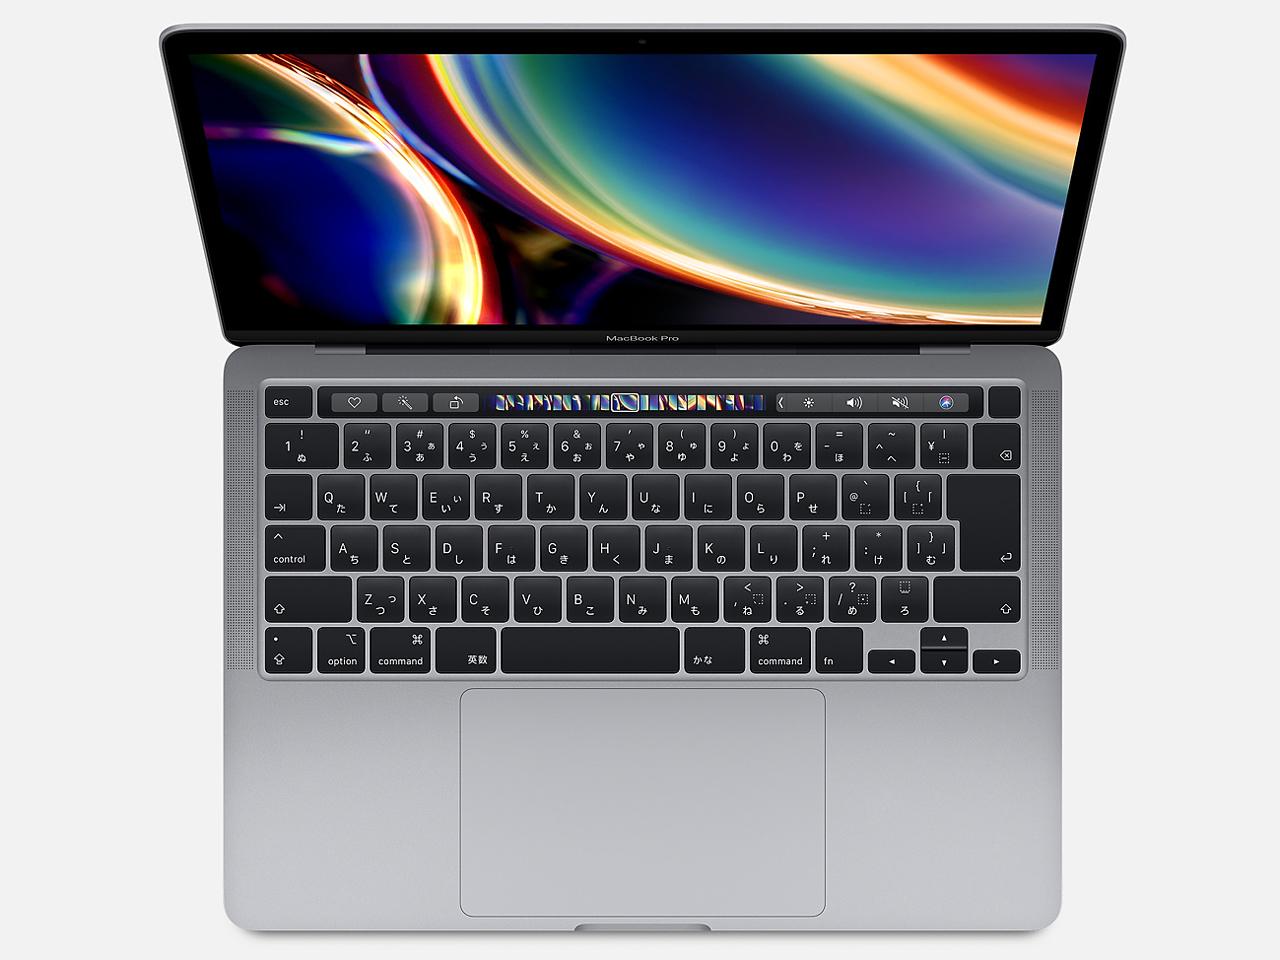 MacBook Pro Retinaディスプレイ 1400/13.3 MXK52J/A [スペースグレイ]